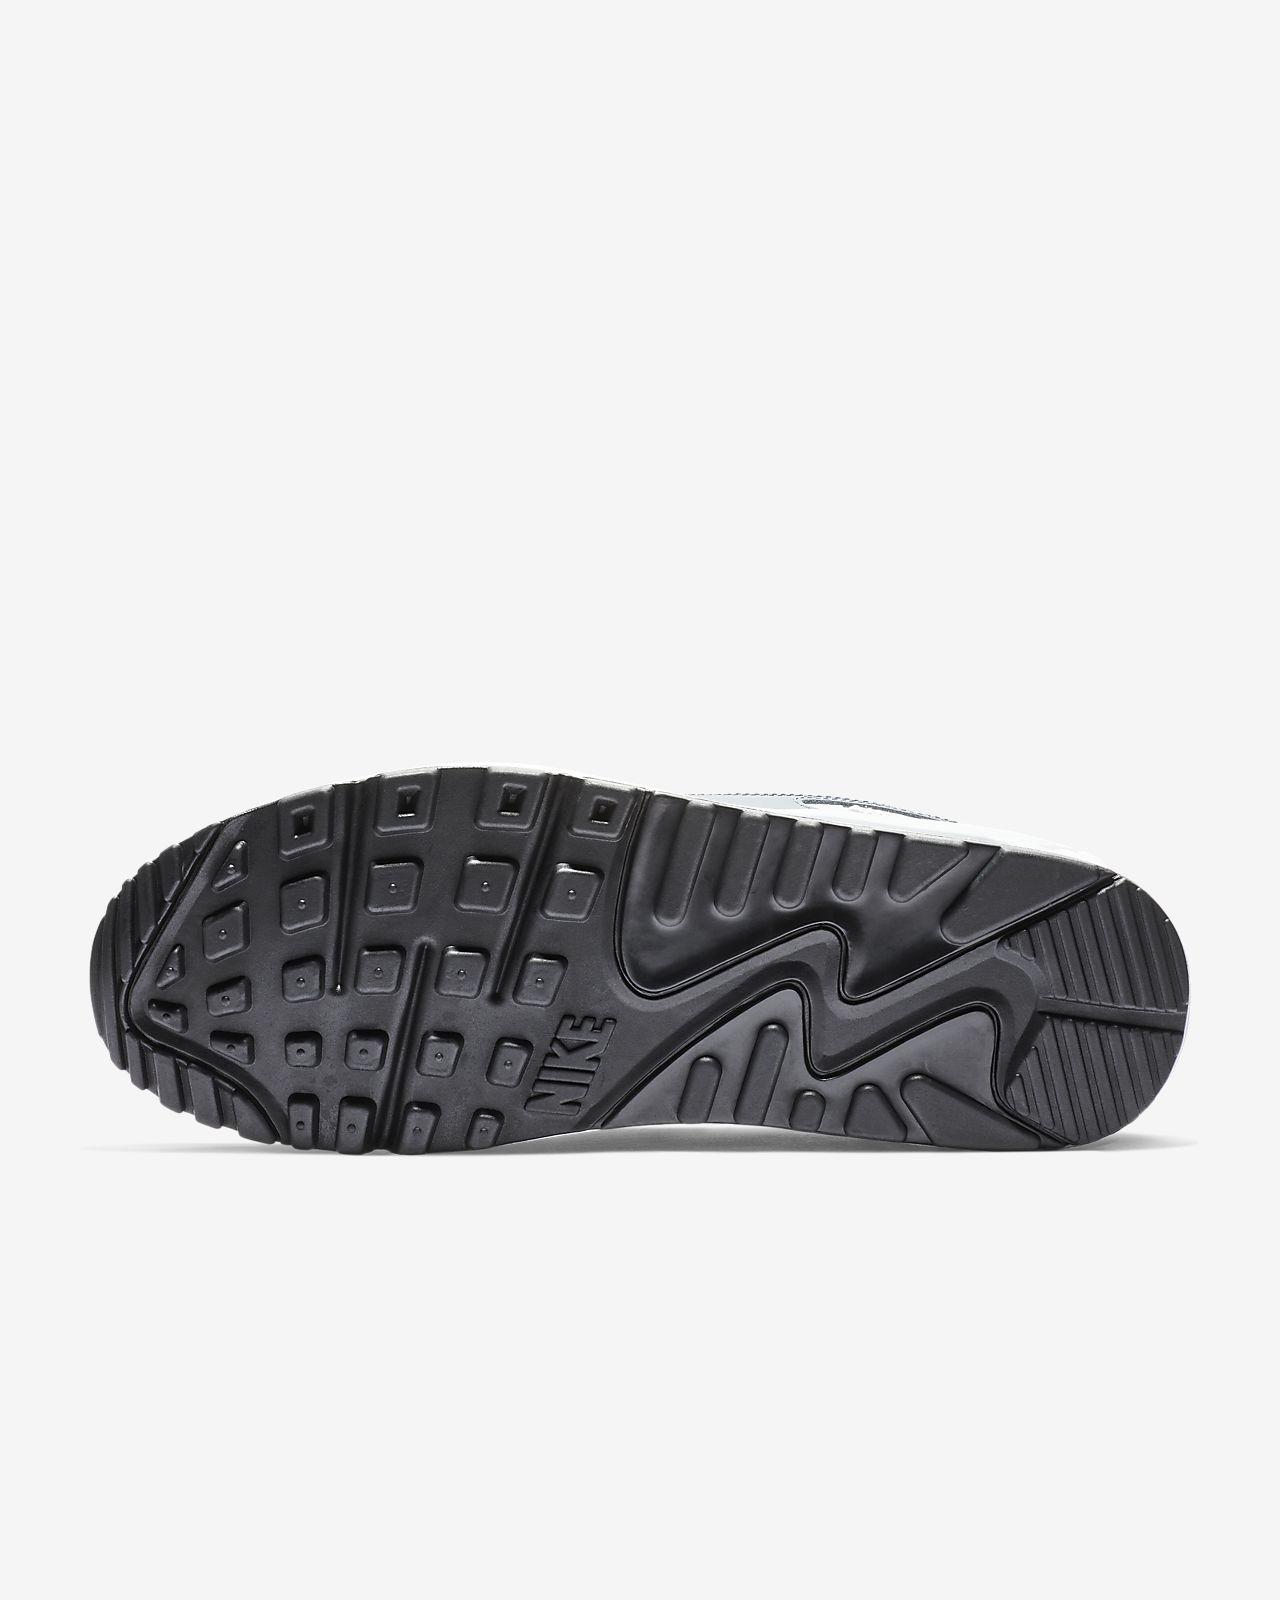 8c4fa94044 Chaussure Nike Air Max 90 SE pour Homme. Nike.com CA